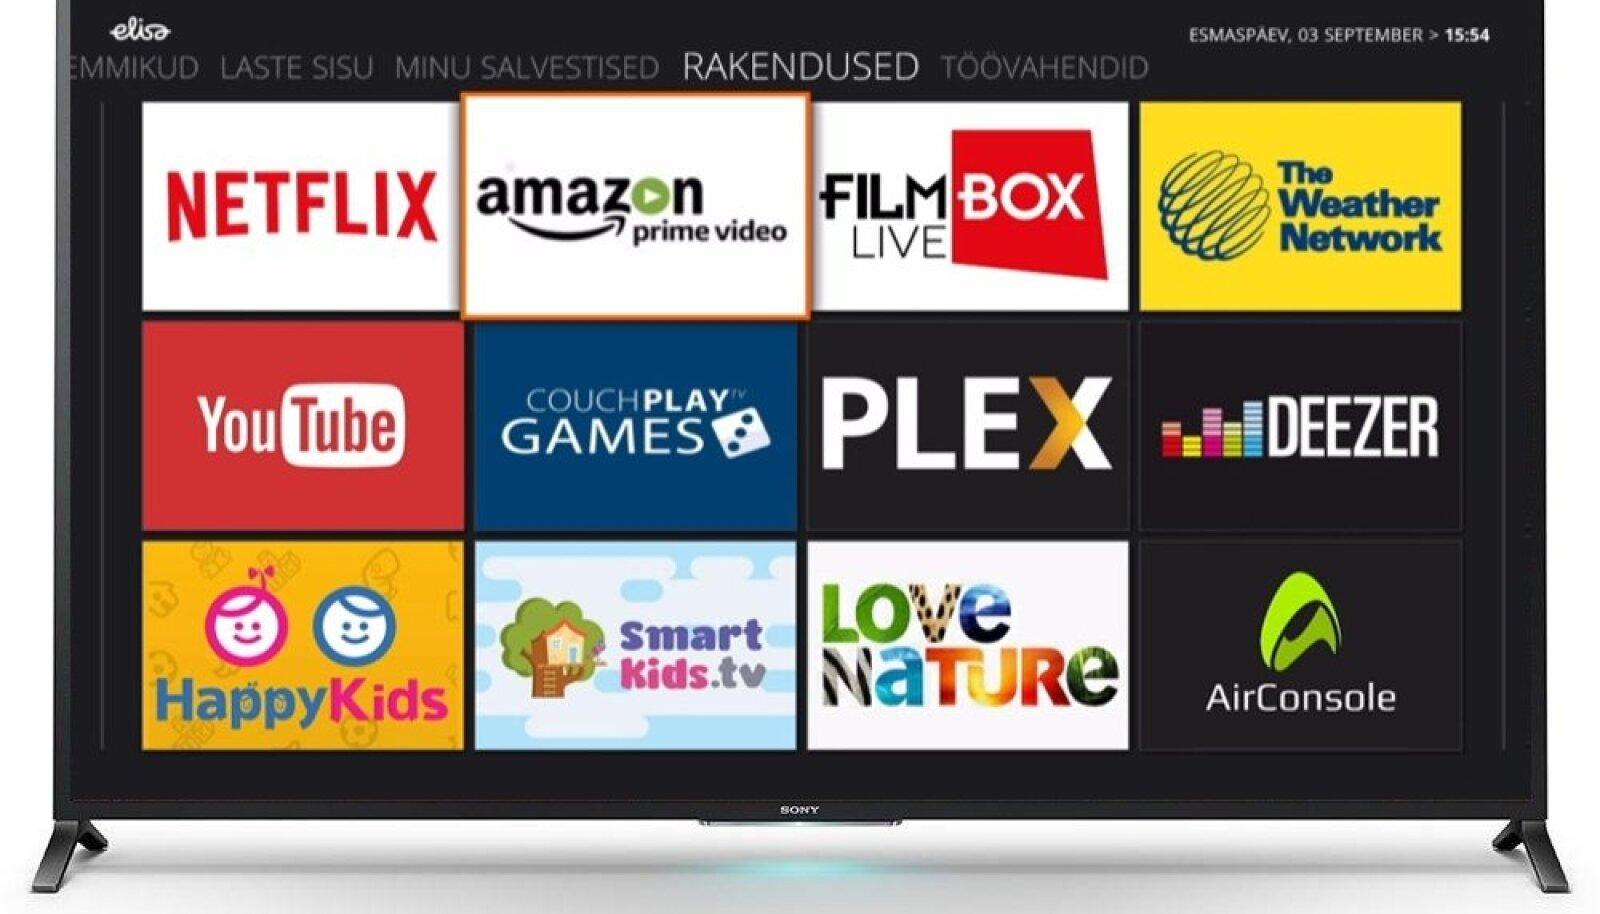 Amazon Prime Video + Elisa Elamus